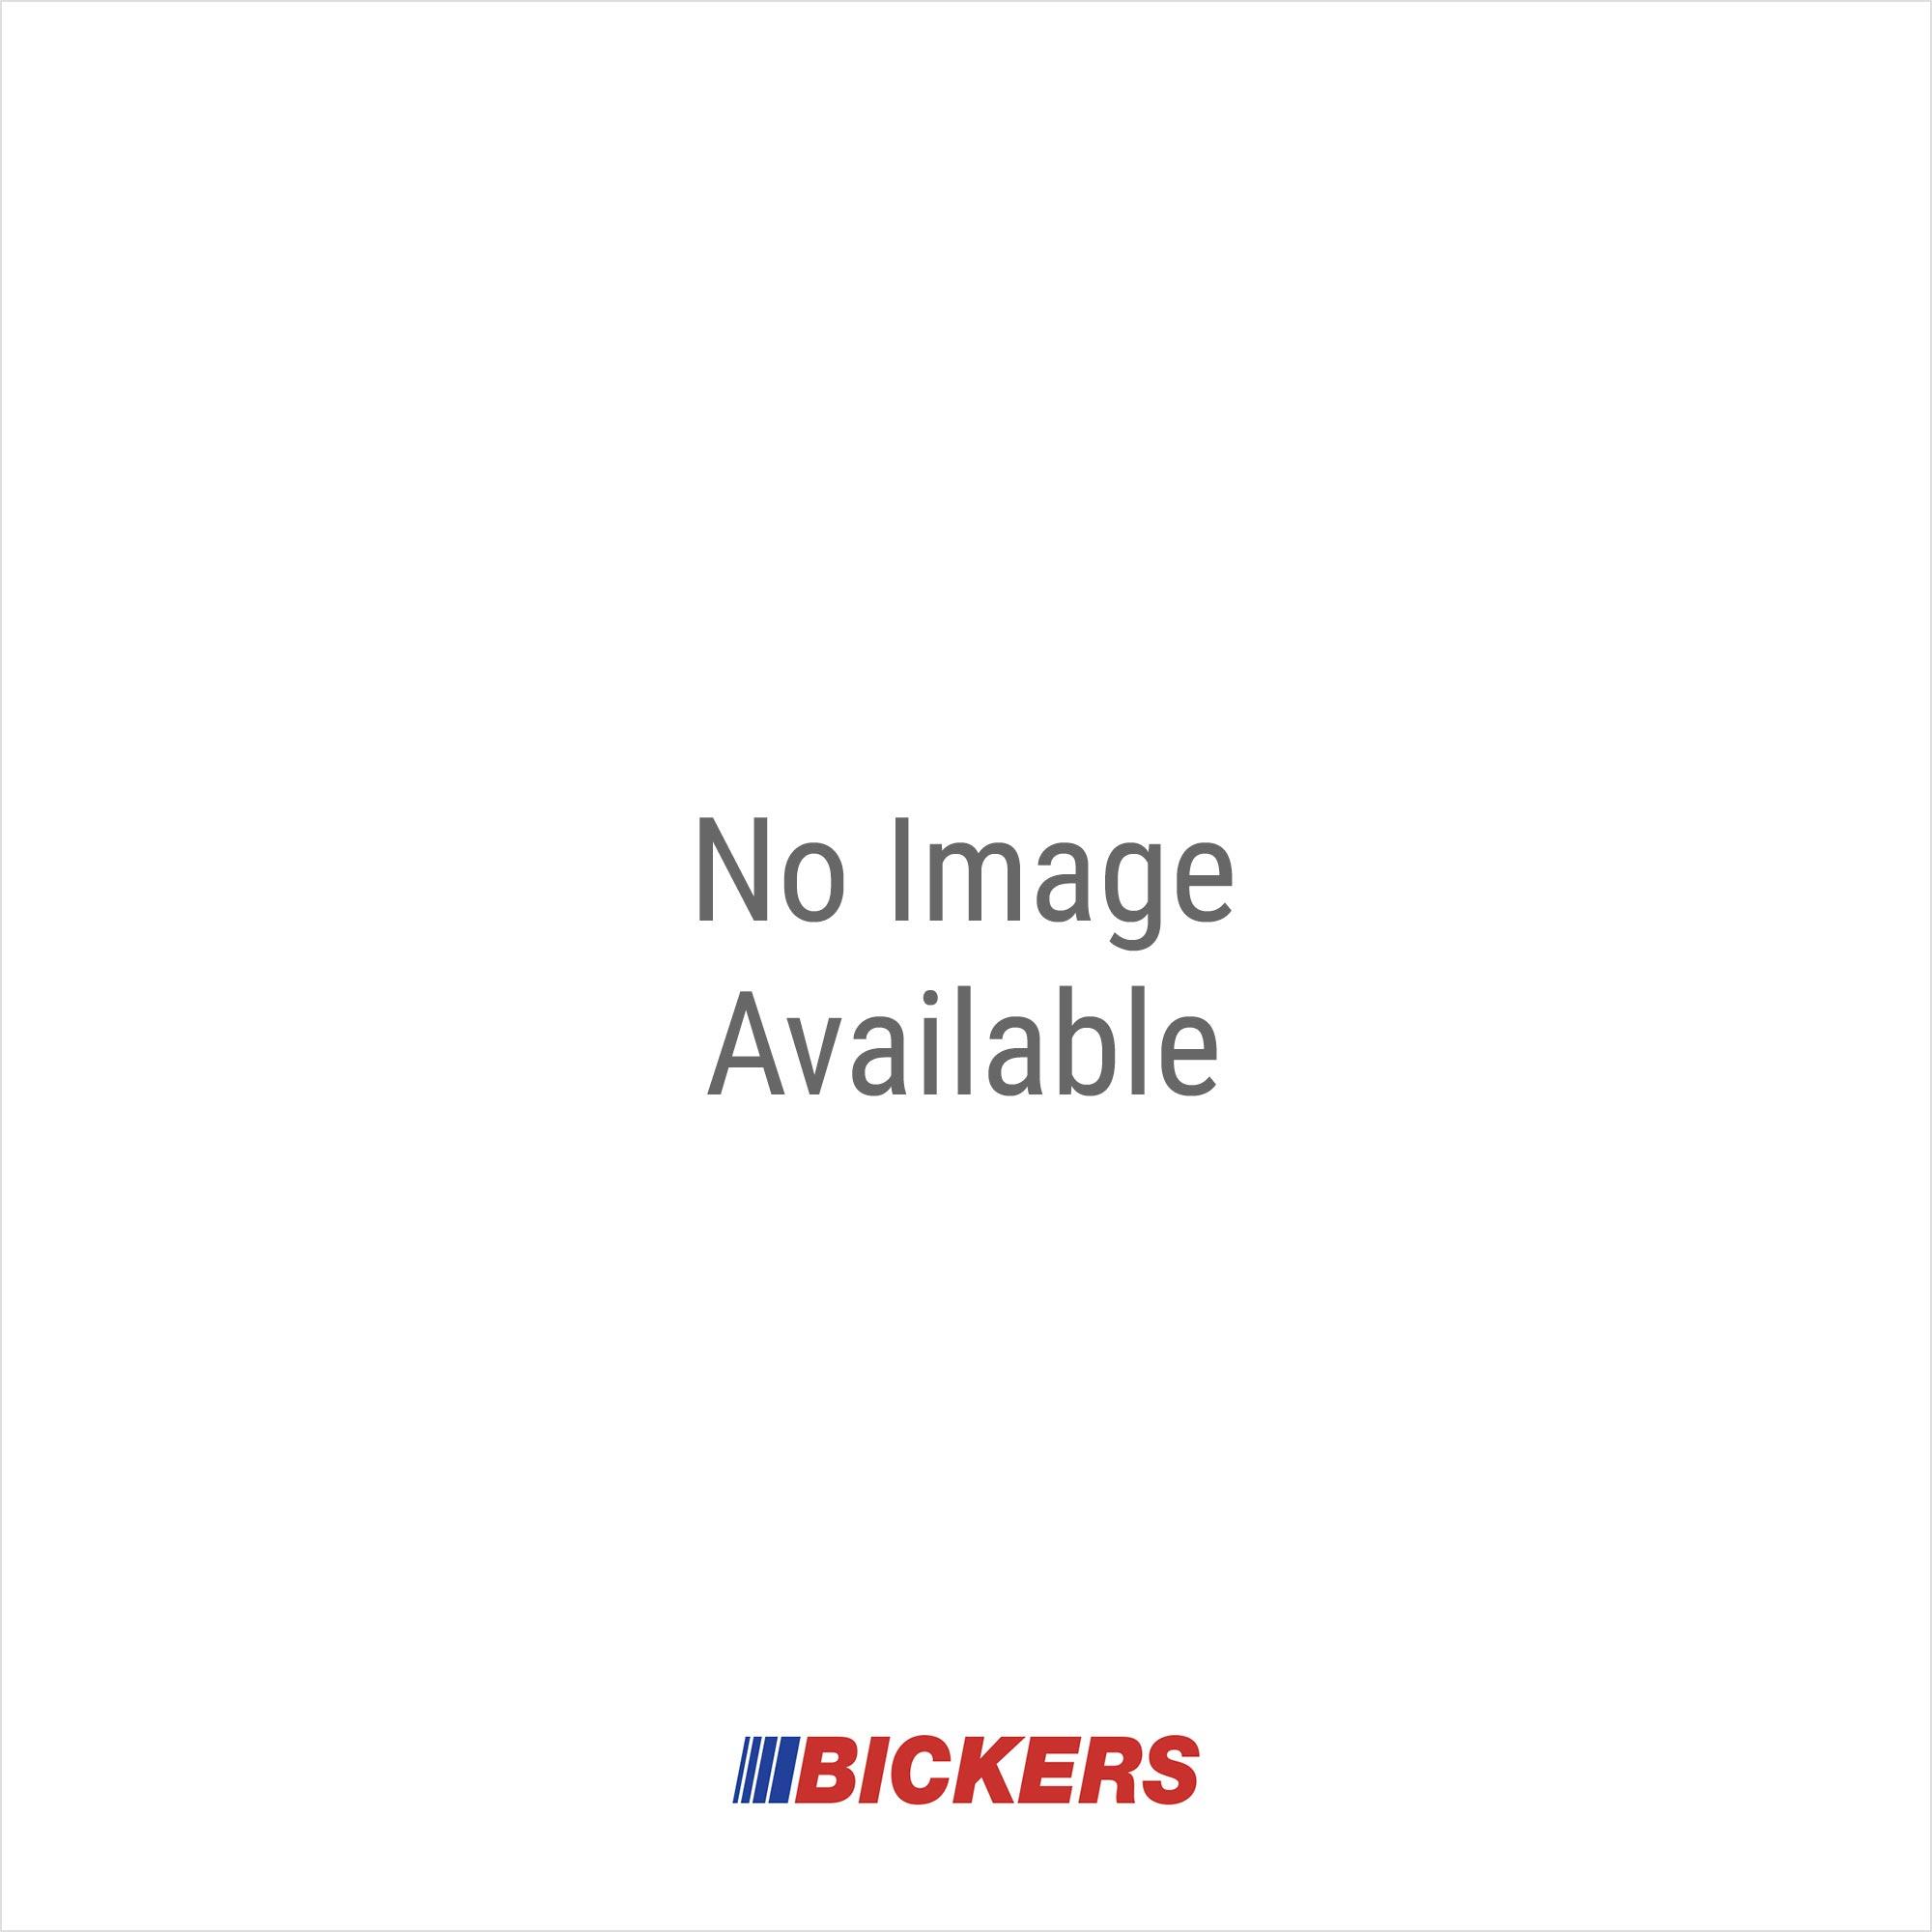 wholesale dealer 31515 ce724 Standard Kit Kawasaki Z1000 (ZR1000 DAF,DBF,DCF,DDF,DDFA) 10-14